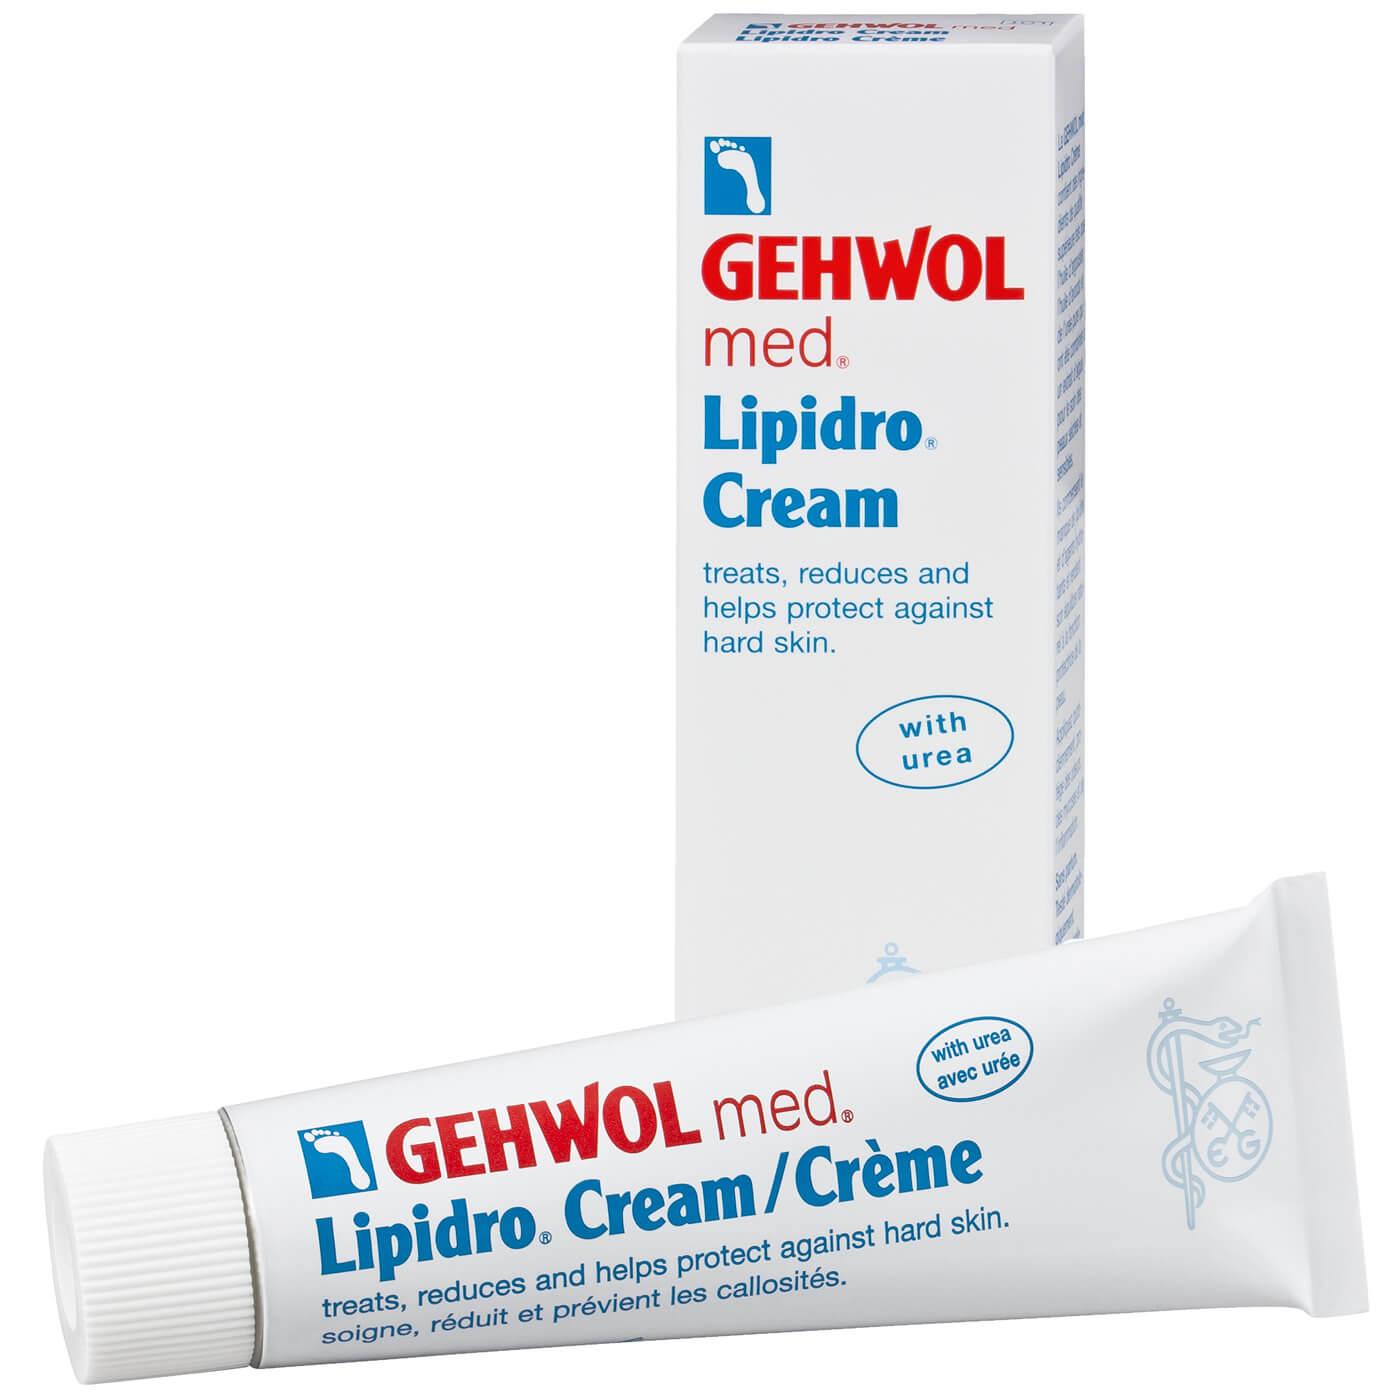 Gehwol Med Lipidro Cream Υδρολιπιδική Κρέμα για Πλούσια Ενυδάτωση – 75ml